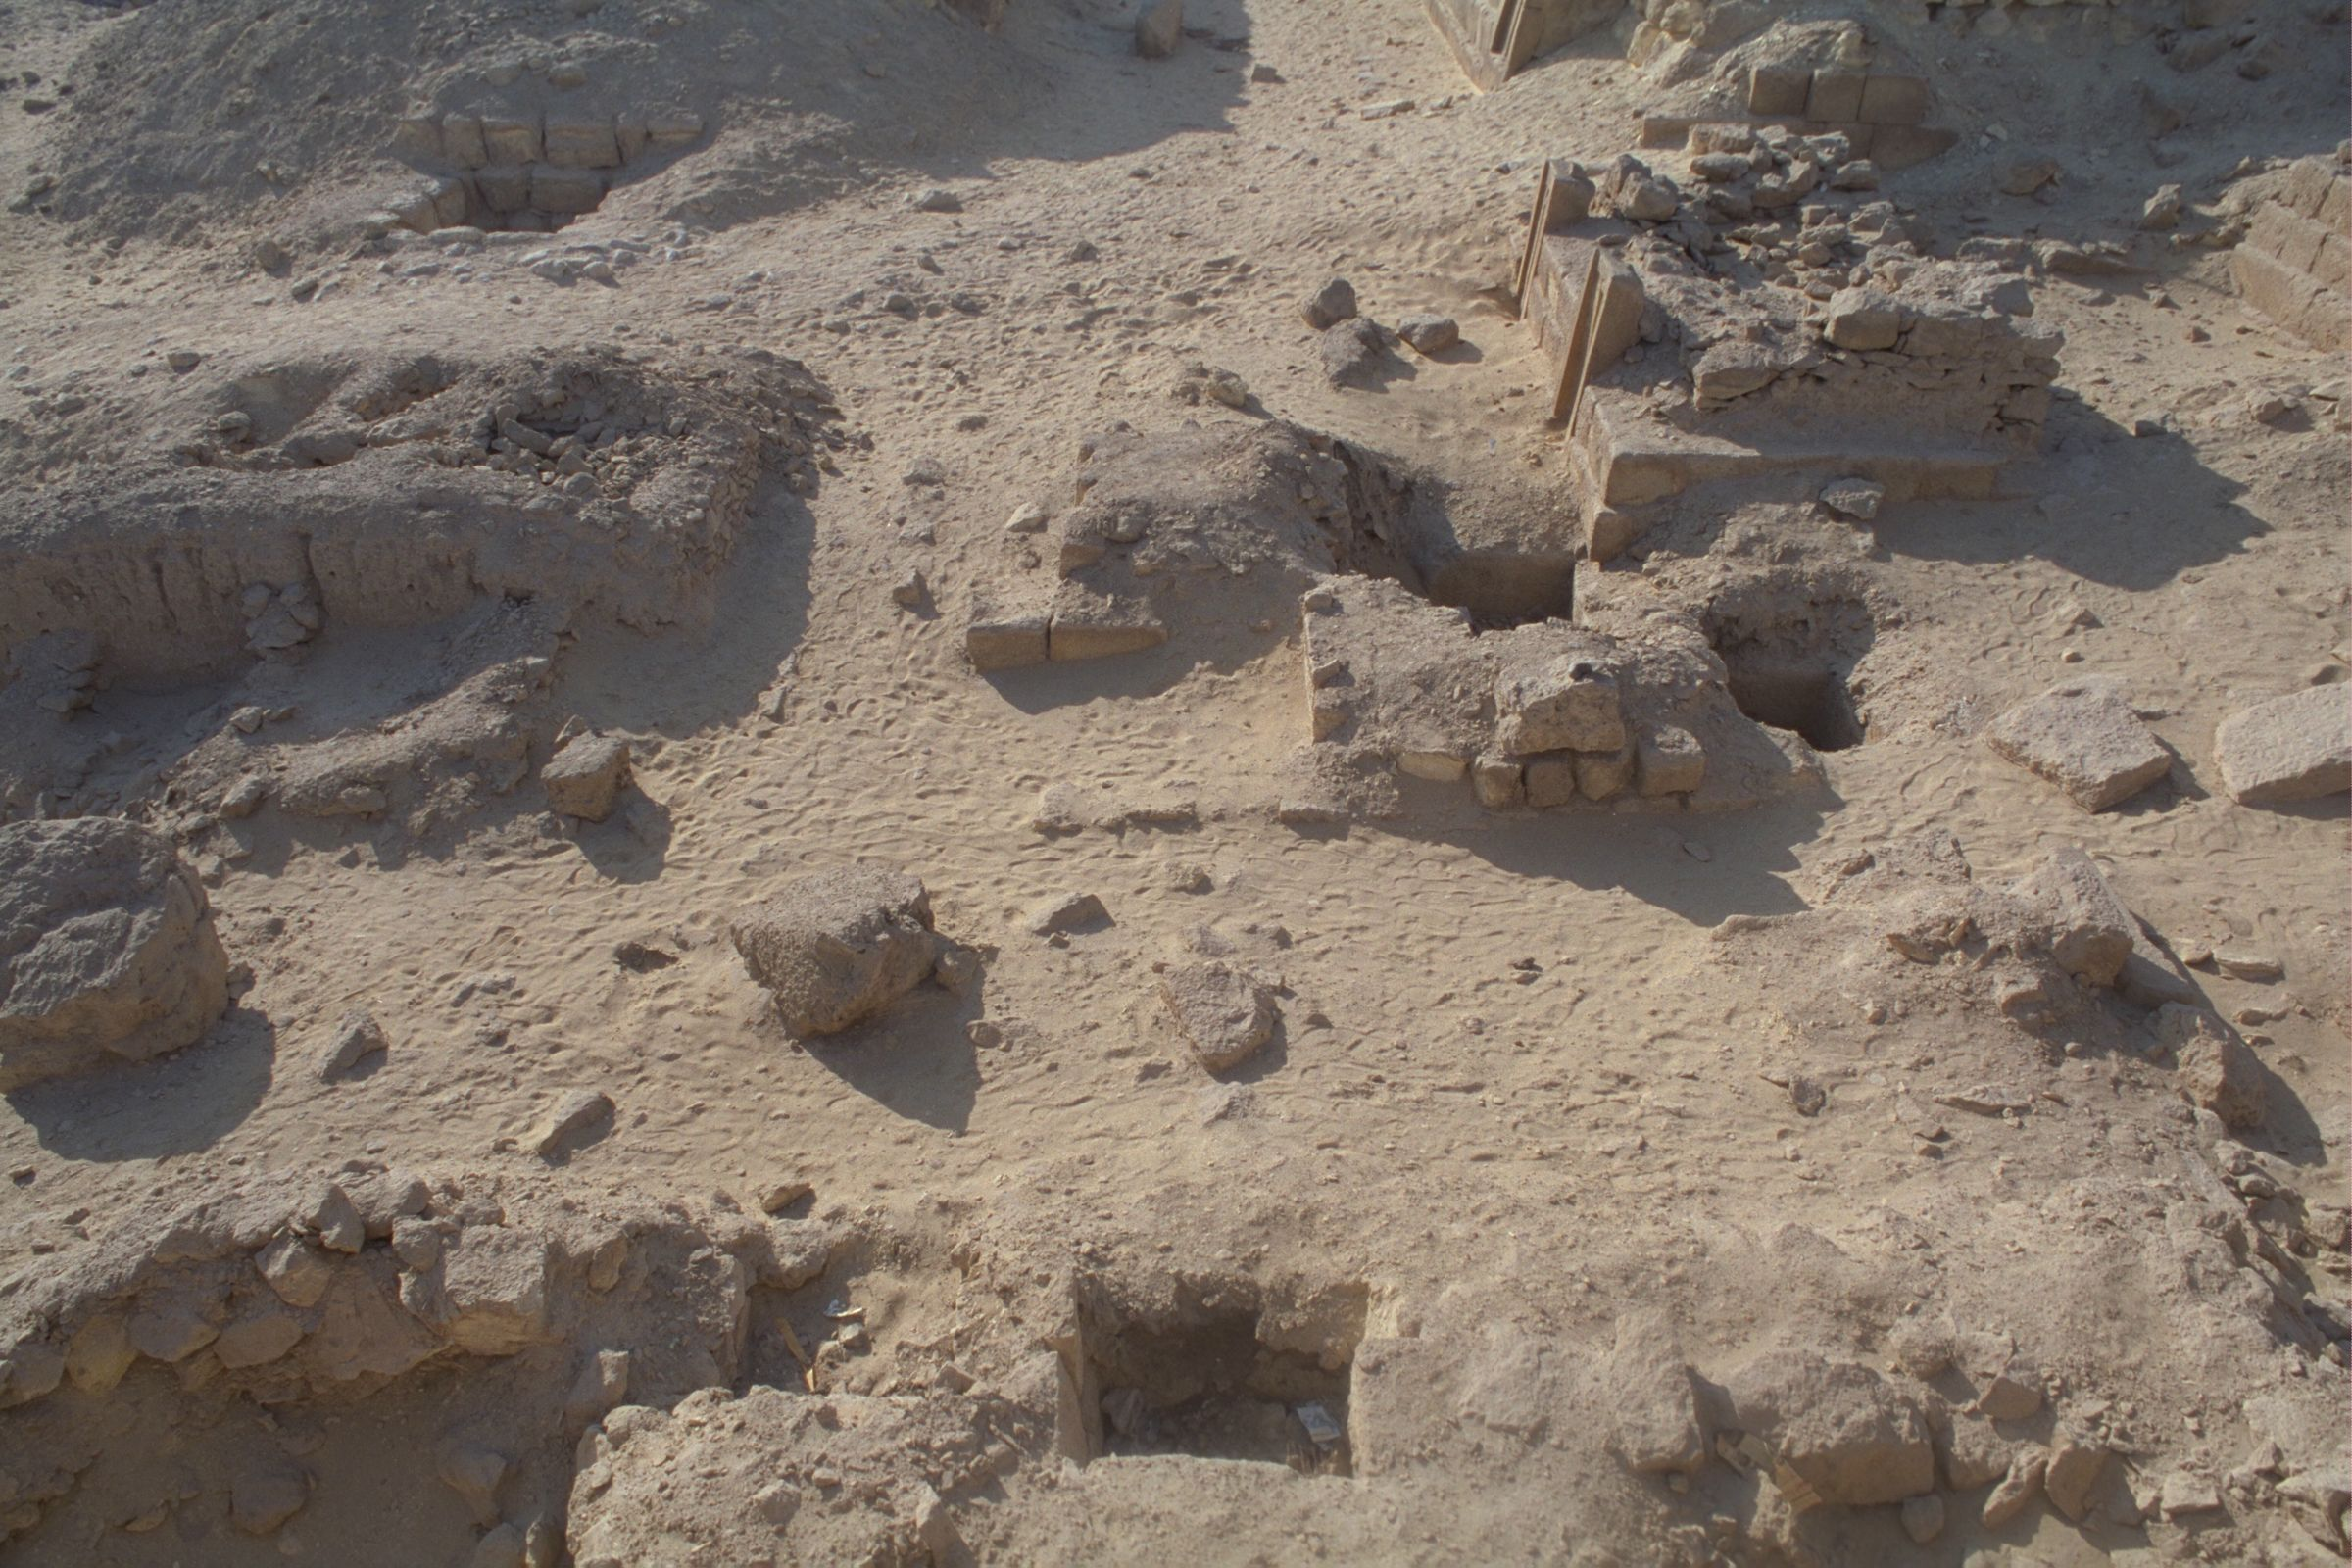 Western Cemetery: Site: Giza; View: G 2156', G 2139, G 2154, G 2154a, G 2153, G 2152, G 2151, G 2136', G 2157